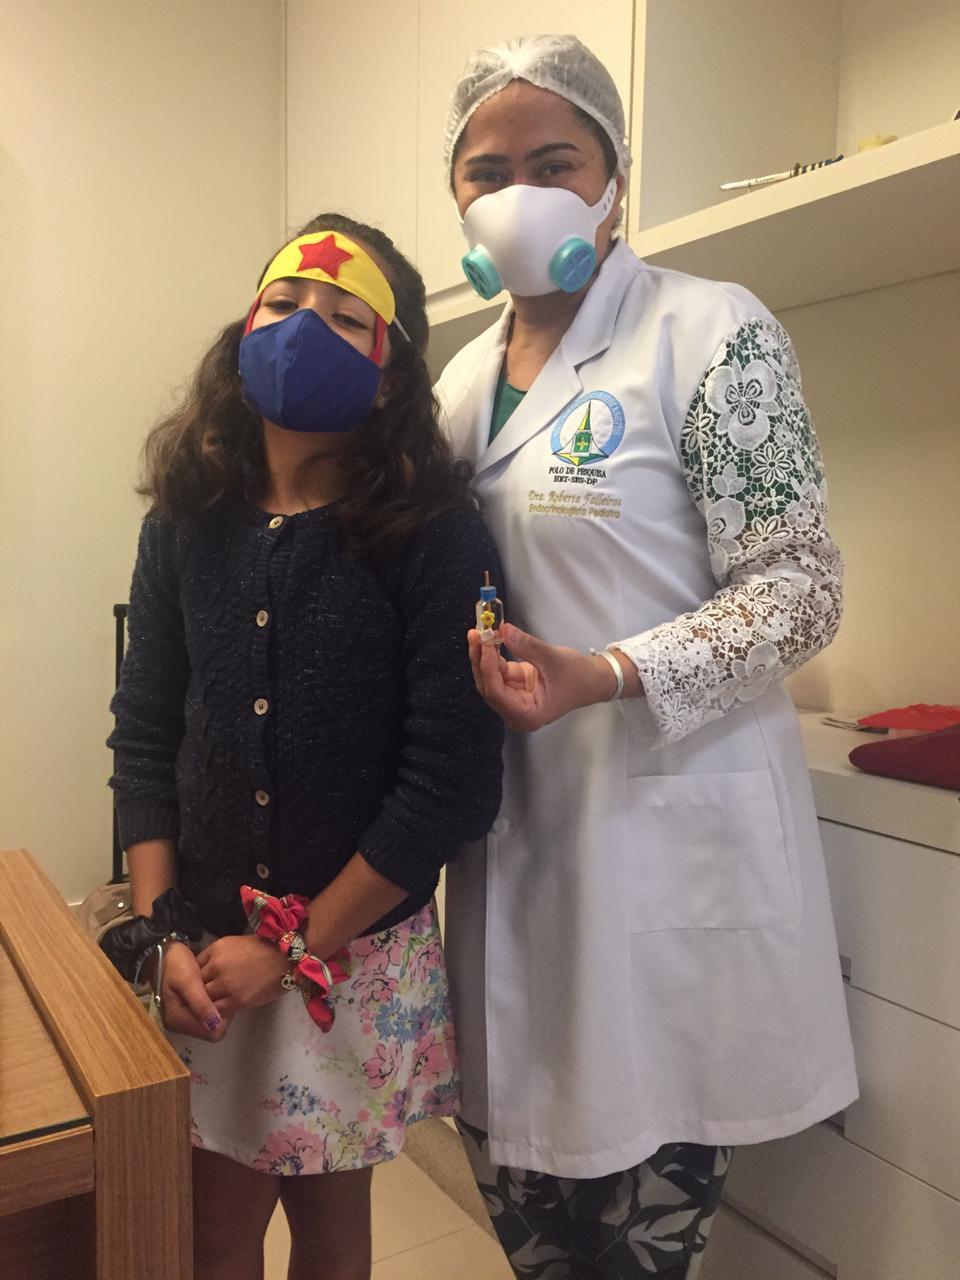 06-Endocrinologista-Pediátrica-Dra.-Roberta-Falleiros-Endocrino-pediatra